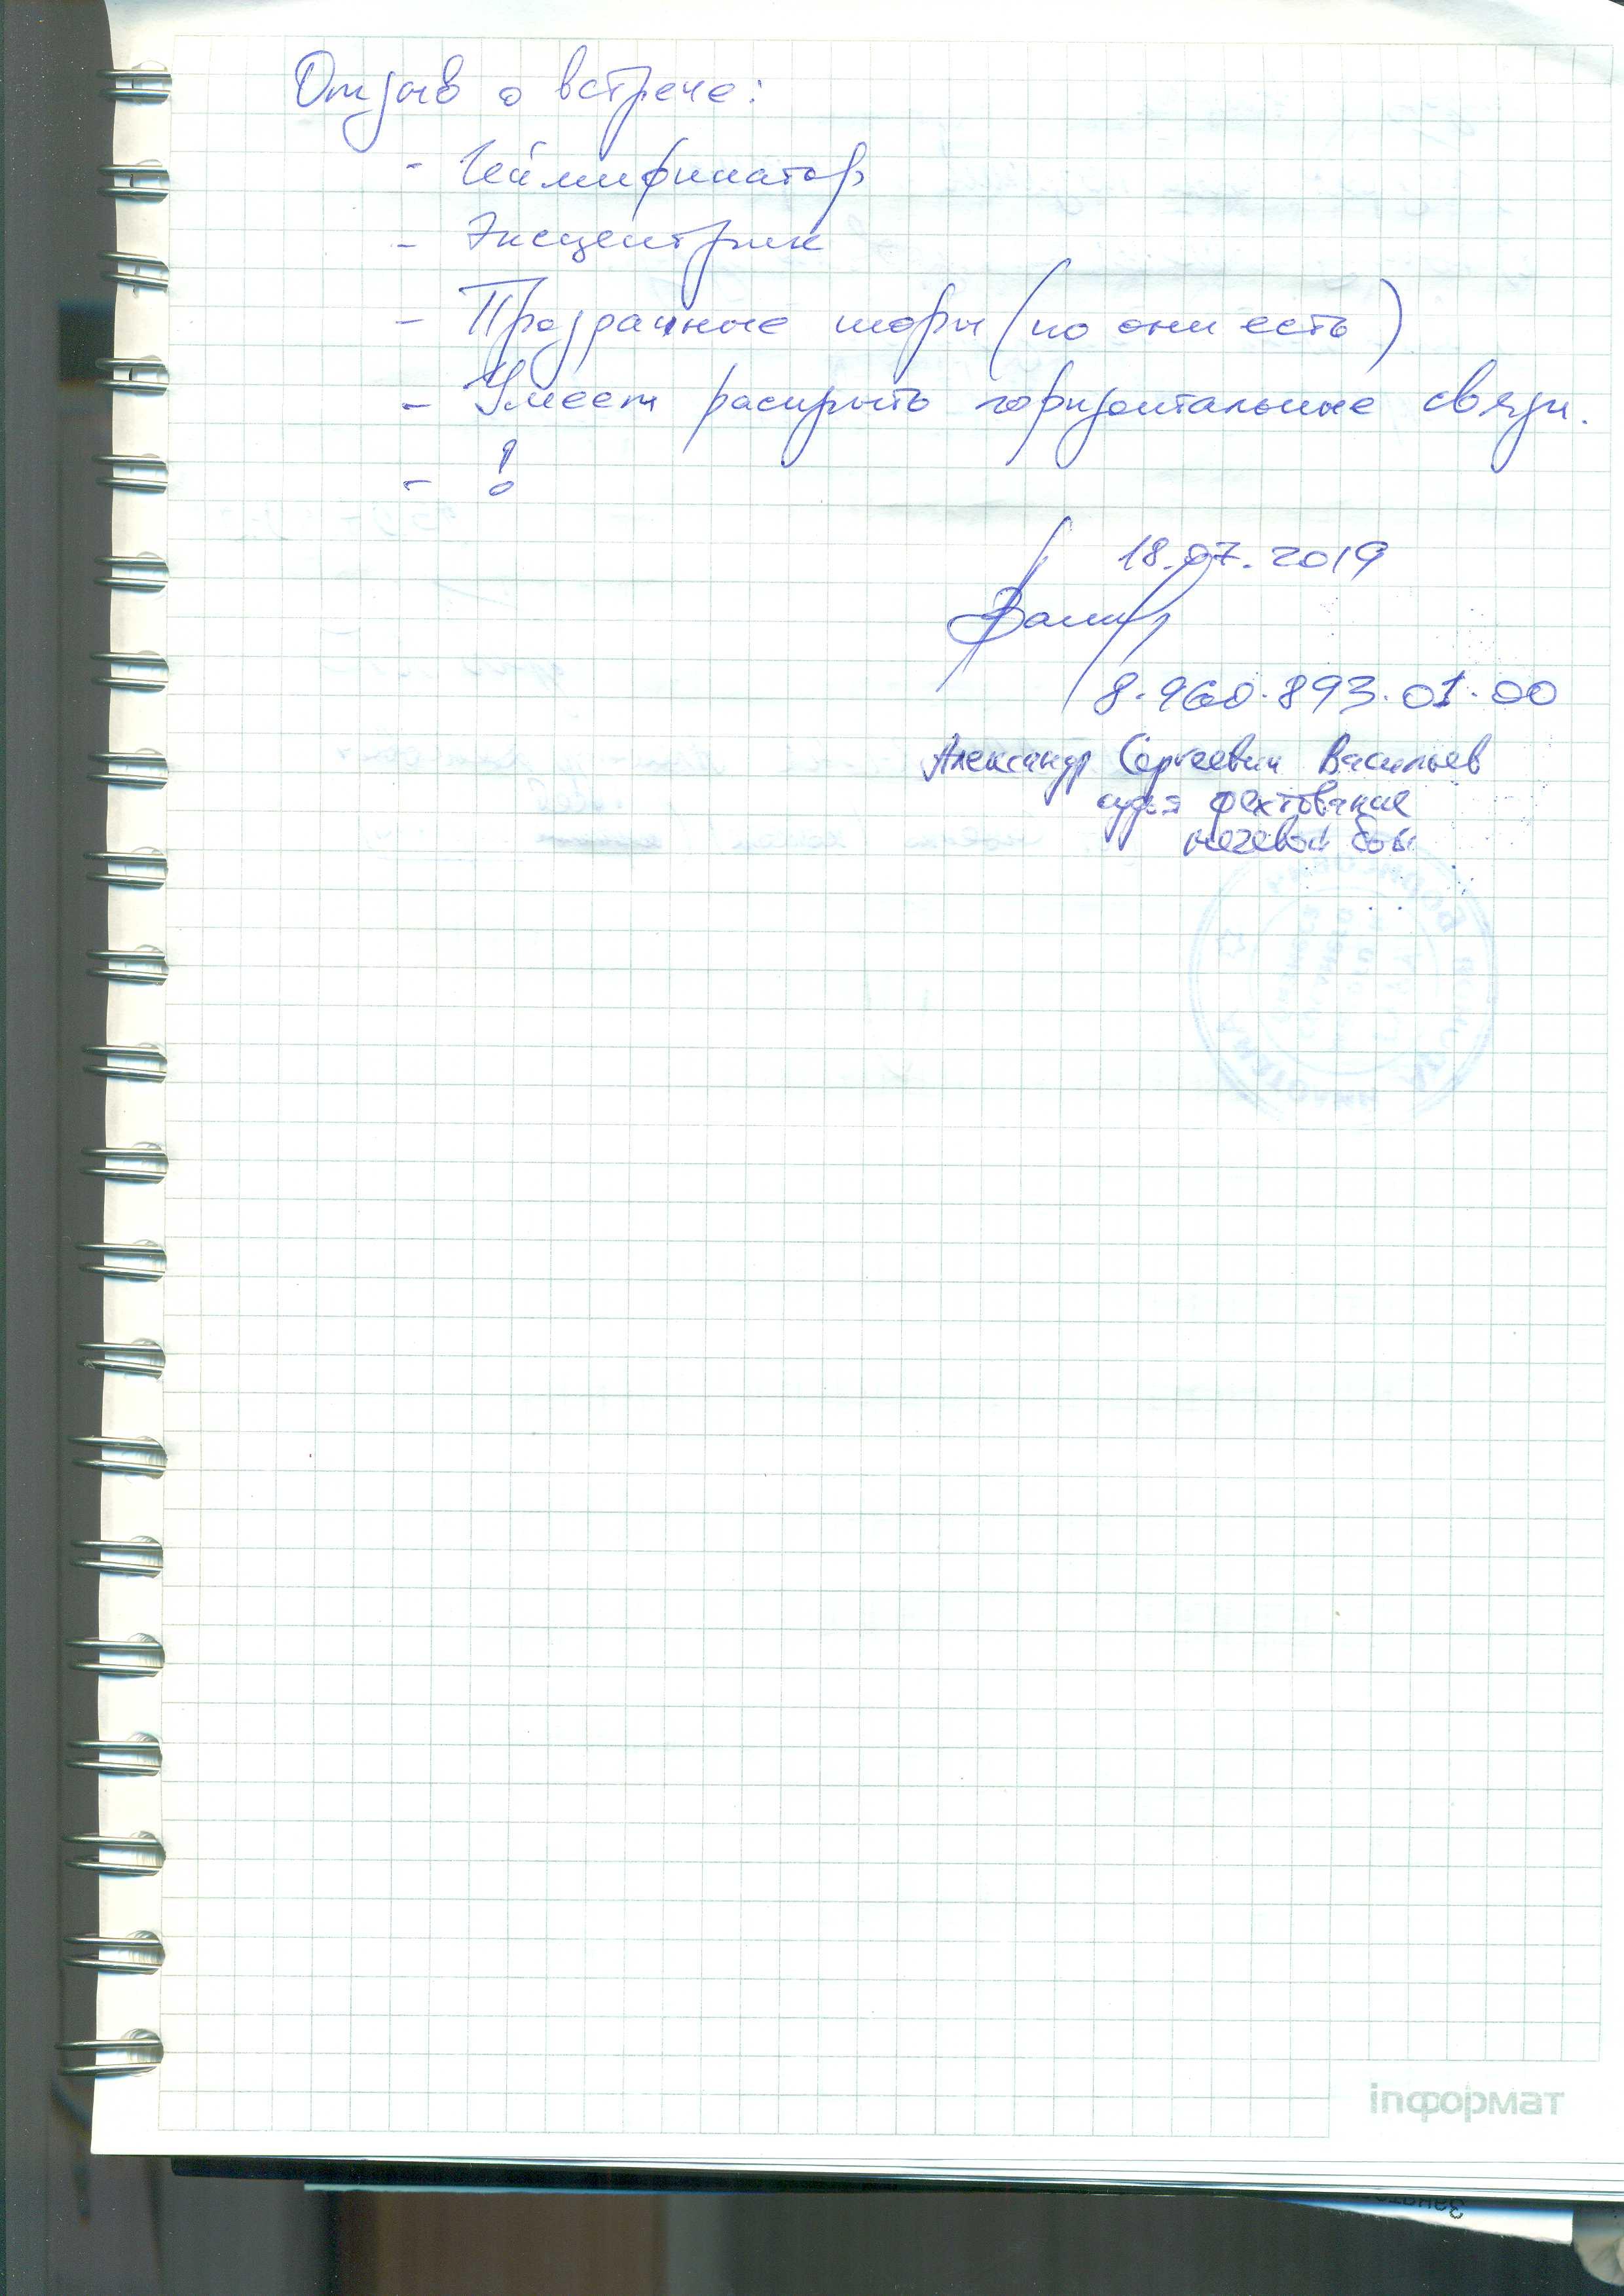 18072019